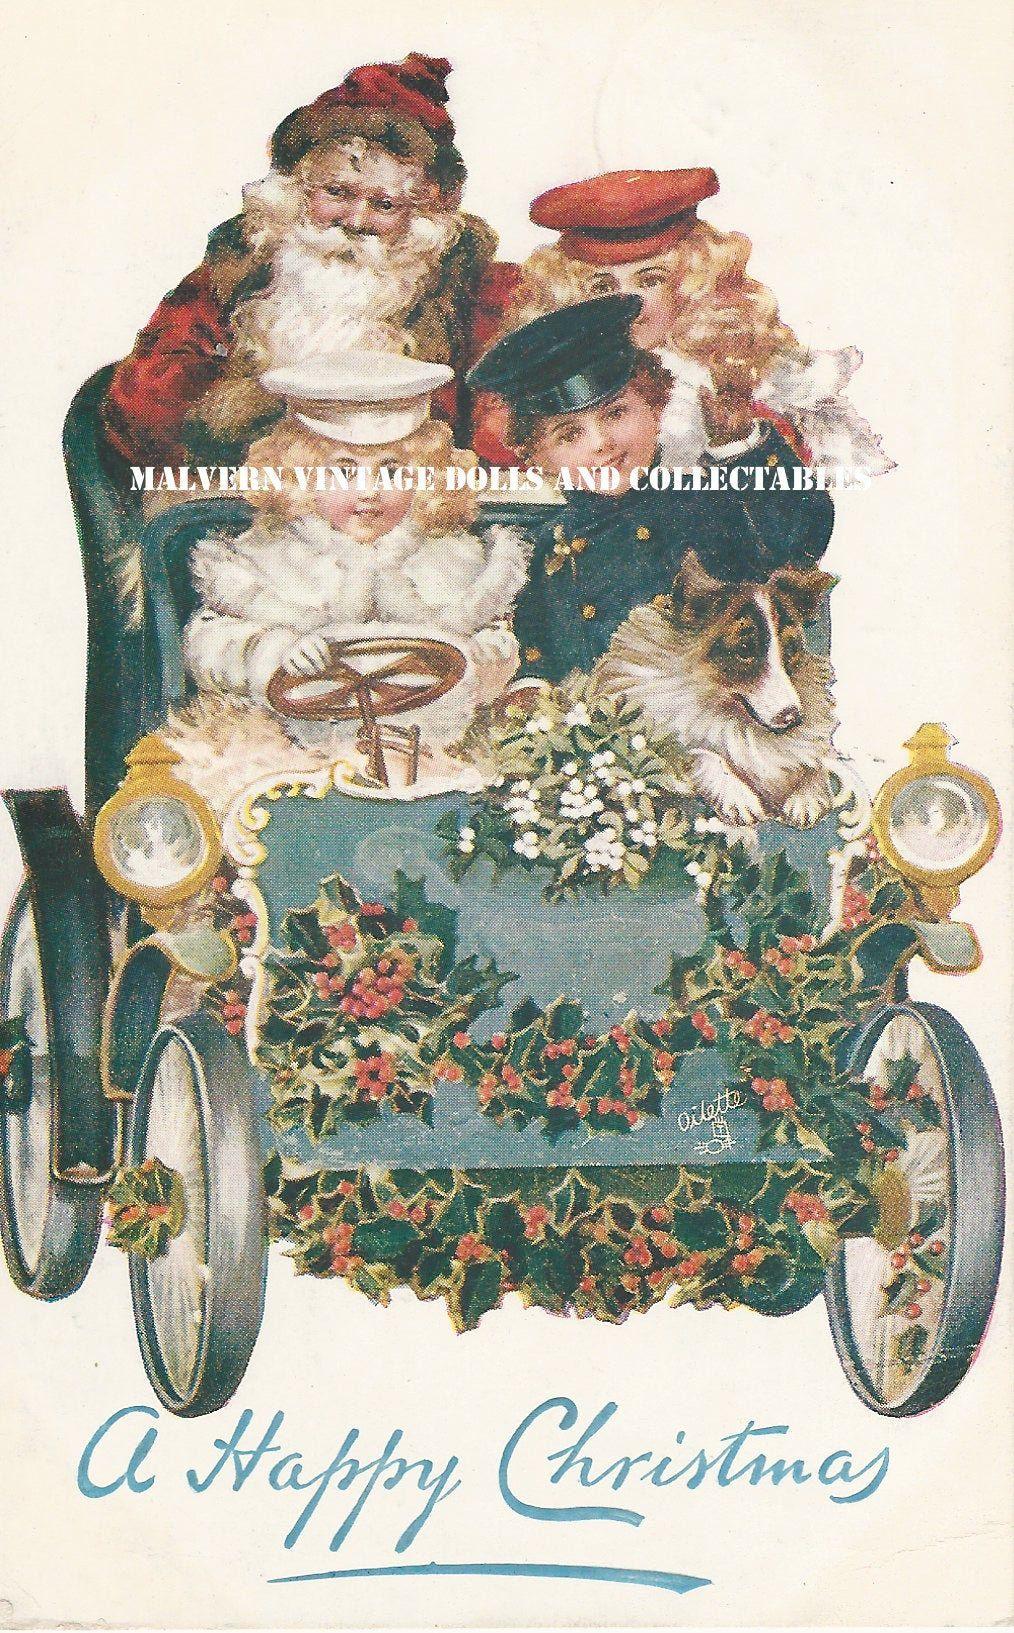 Malvern Victorian Christmas 2020 Antique Victorian Christmas Card Image PDF Instant Digital